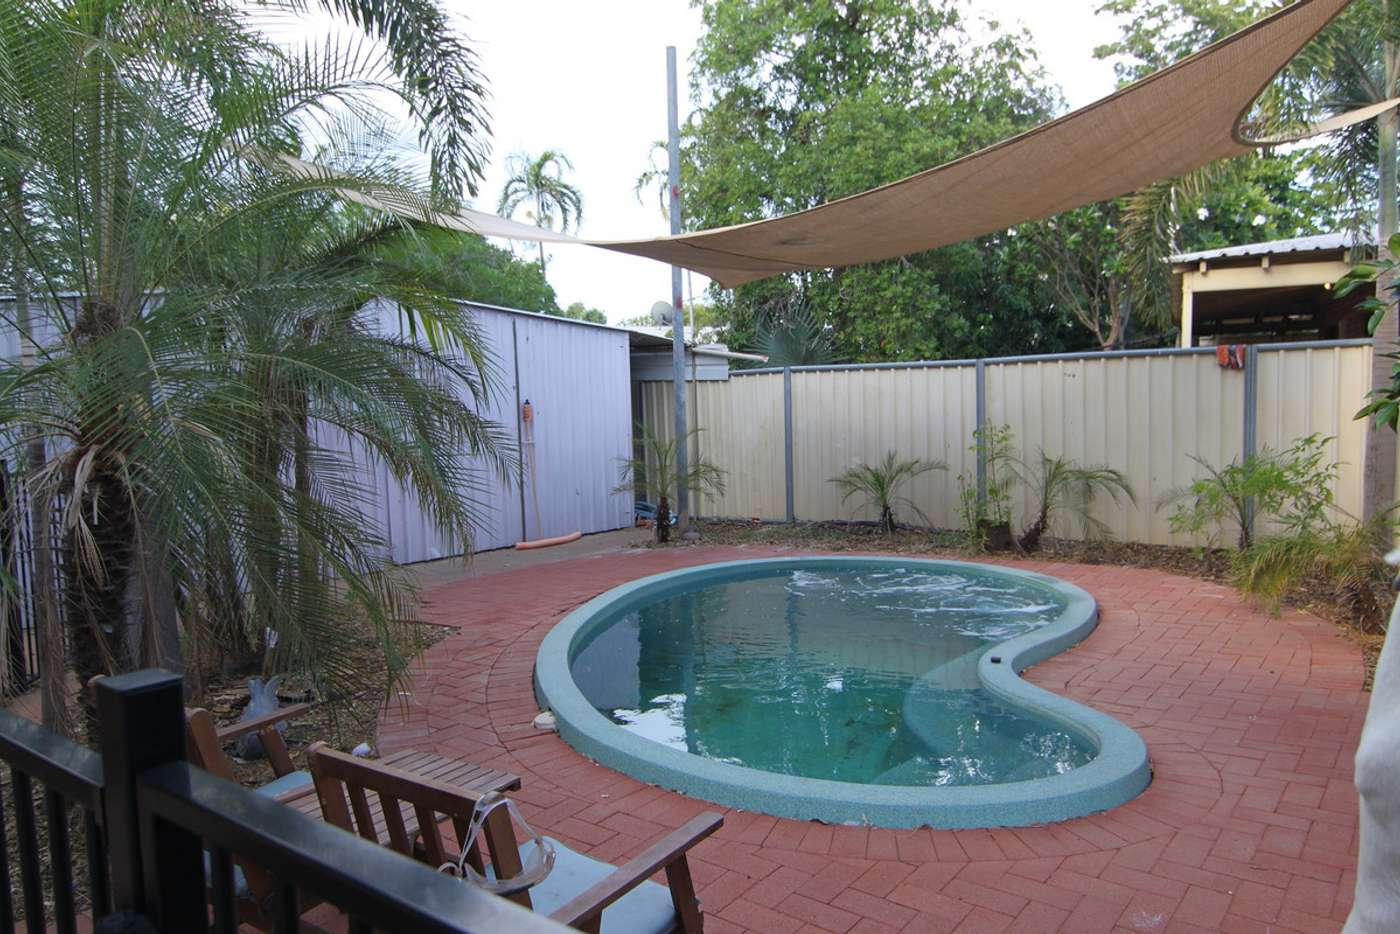 Main view of Homely house listing, 33 Eucalyptus Close, Kununurra WA 6743